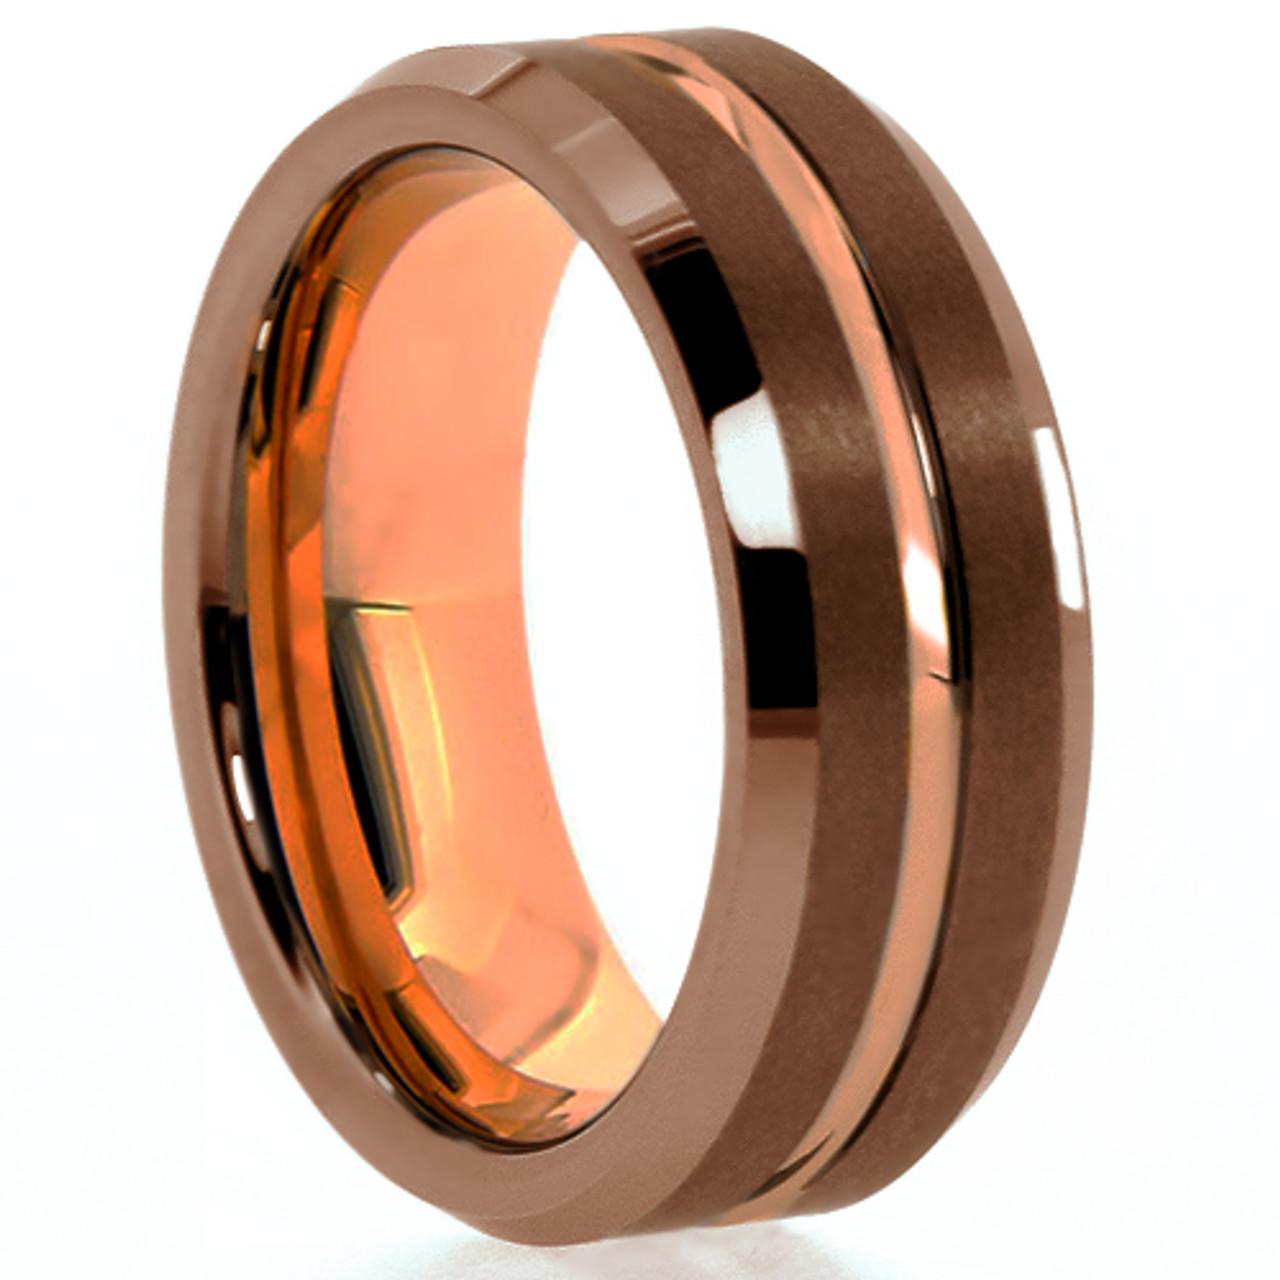 Rose Gold Ring Mens Wedding Band Brown Ring 8mm Engagement Band Brown Tungsten Carbide 18k Rose Gold Wedding Band Brushed Brown Domed Ring